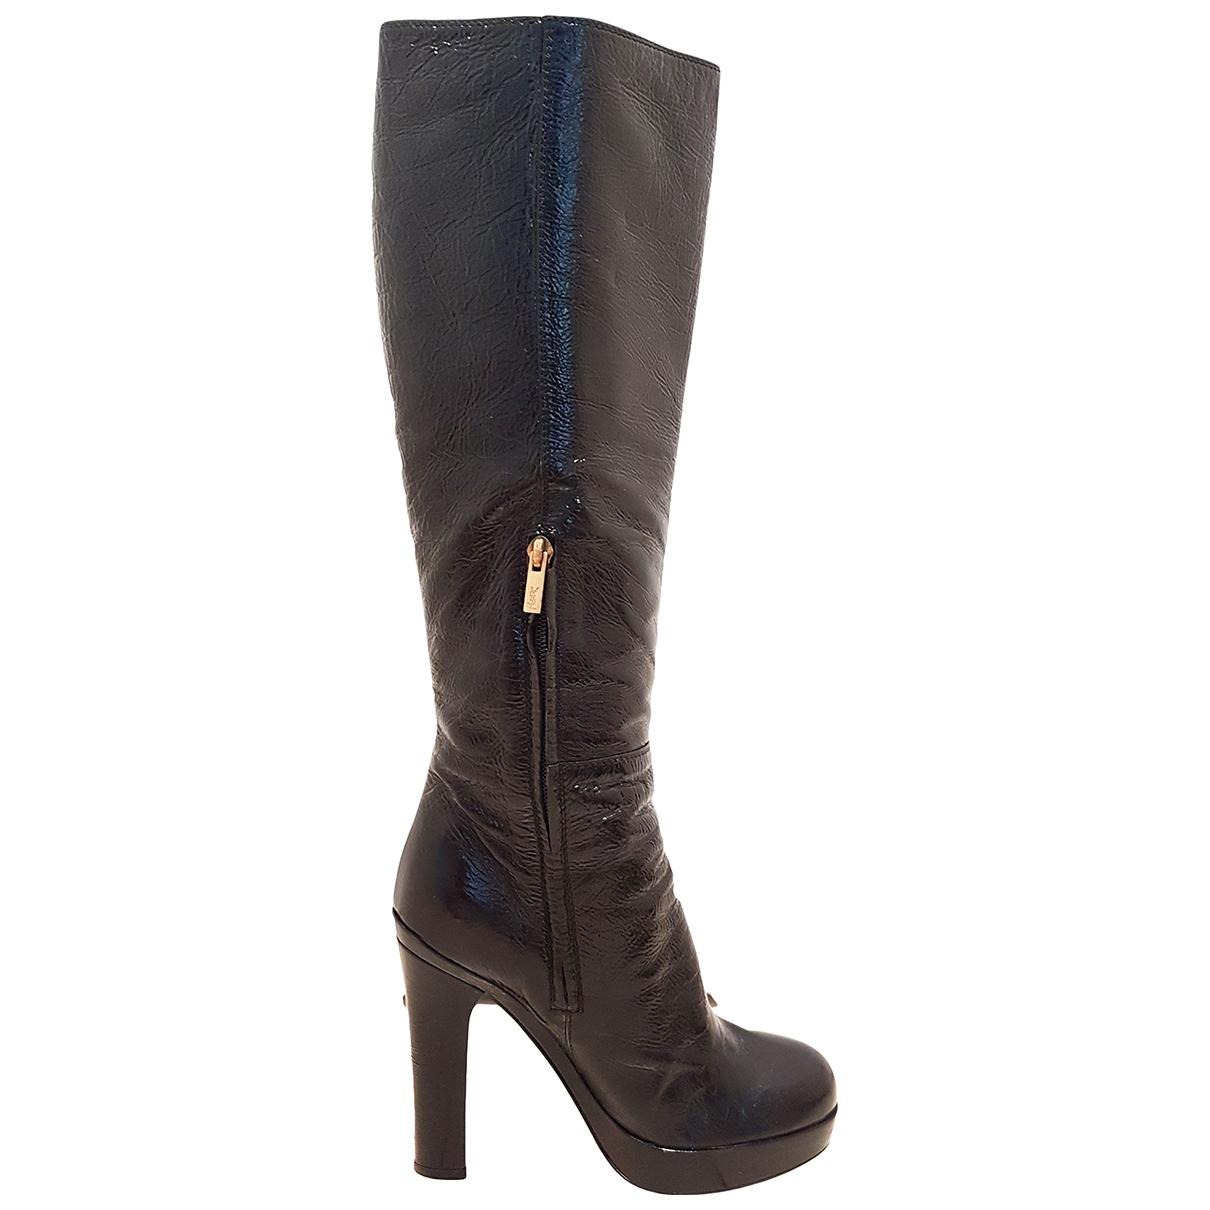 Yves Saint Laurent \N Stiefel in  Schwarz Lackleder